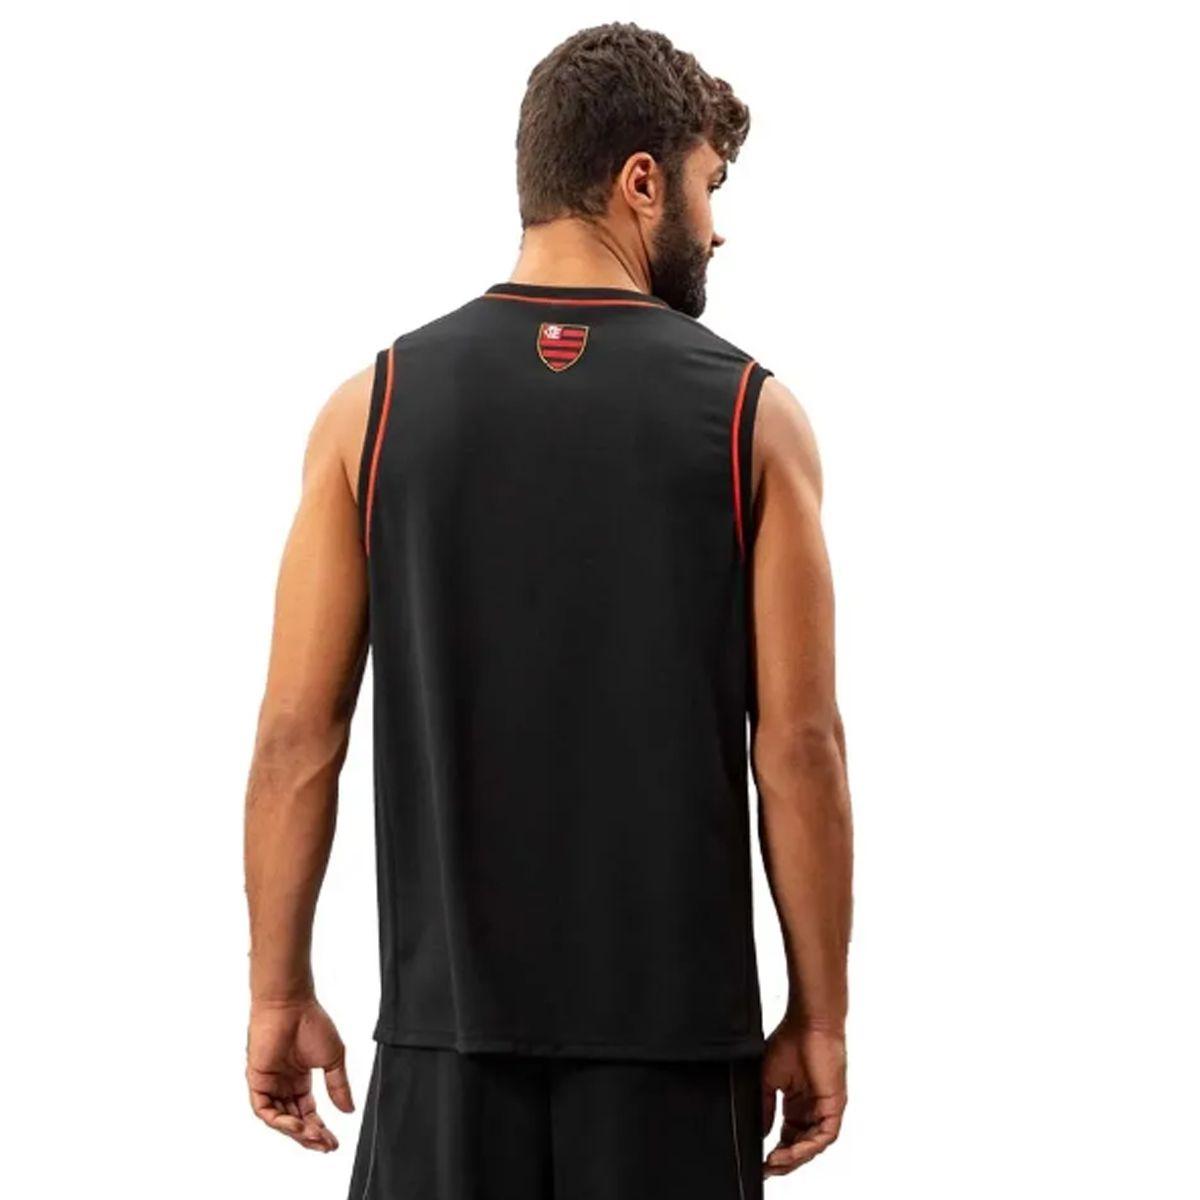 Camisa do Flamengo Regata Alone